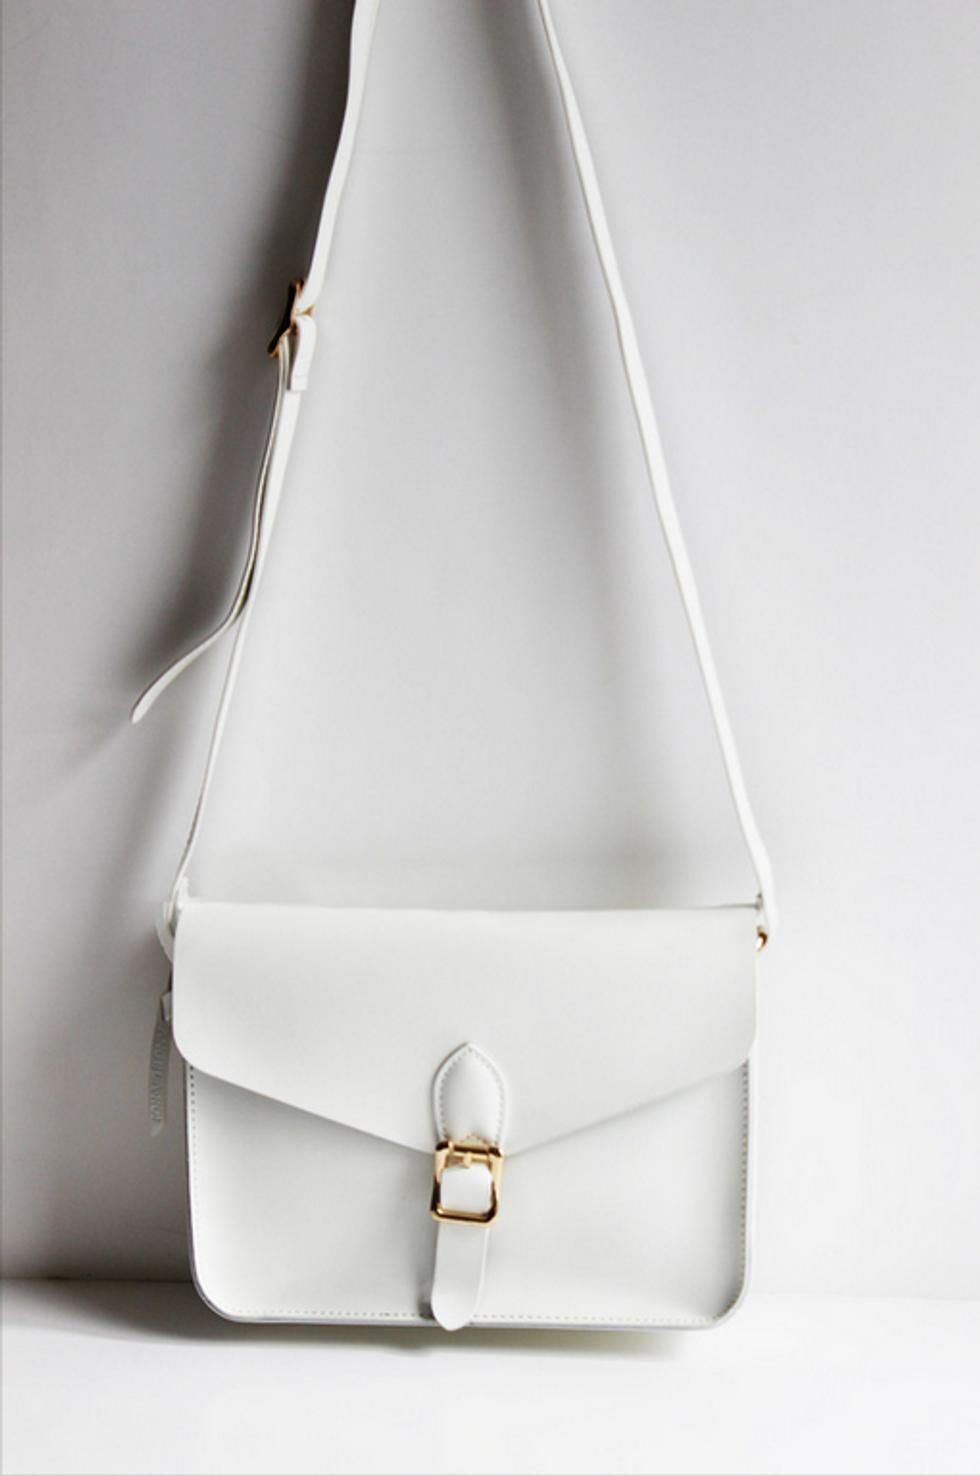 Roll Call: Cruelty-Free Handbags